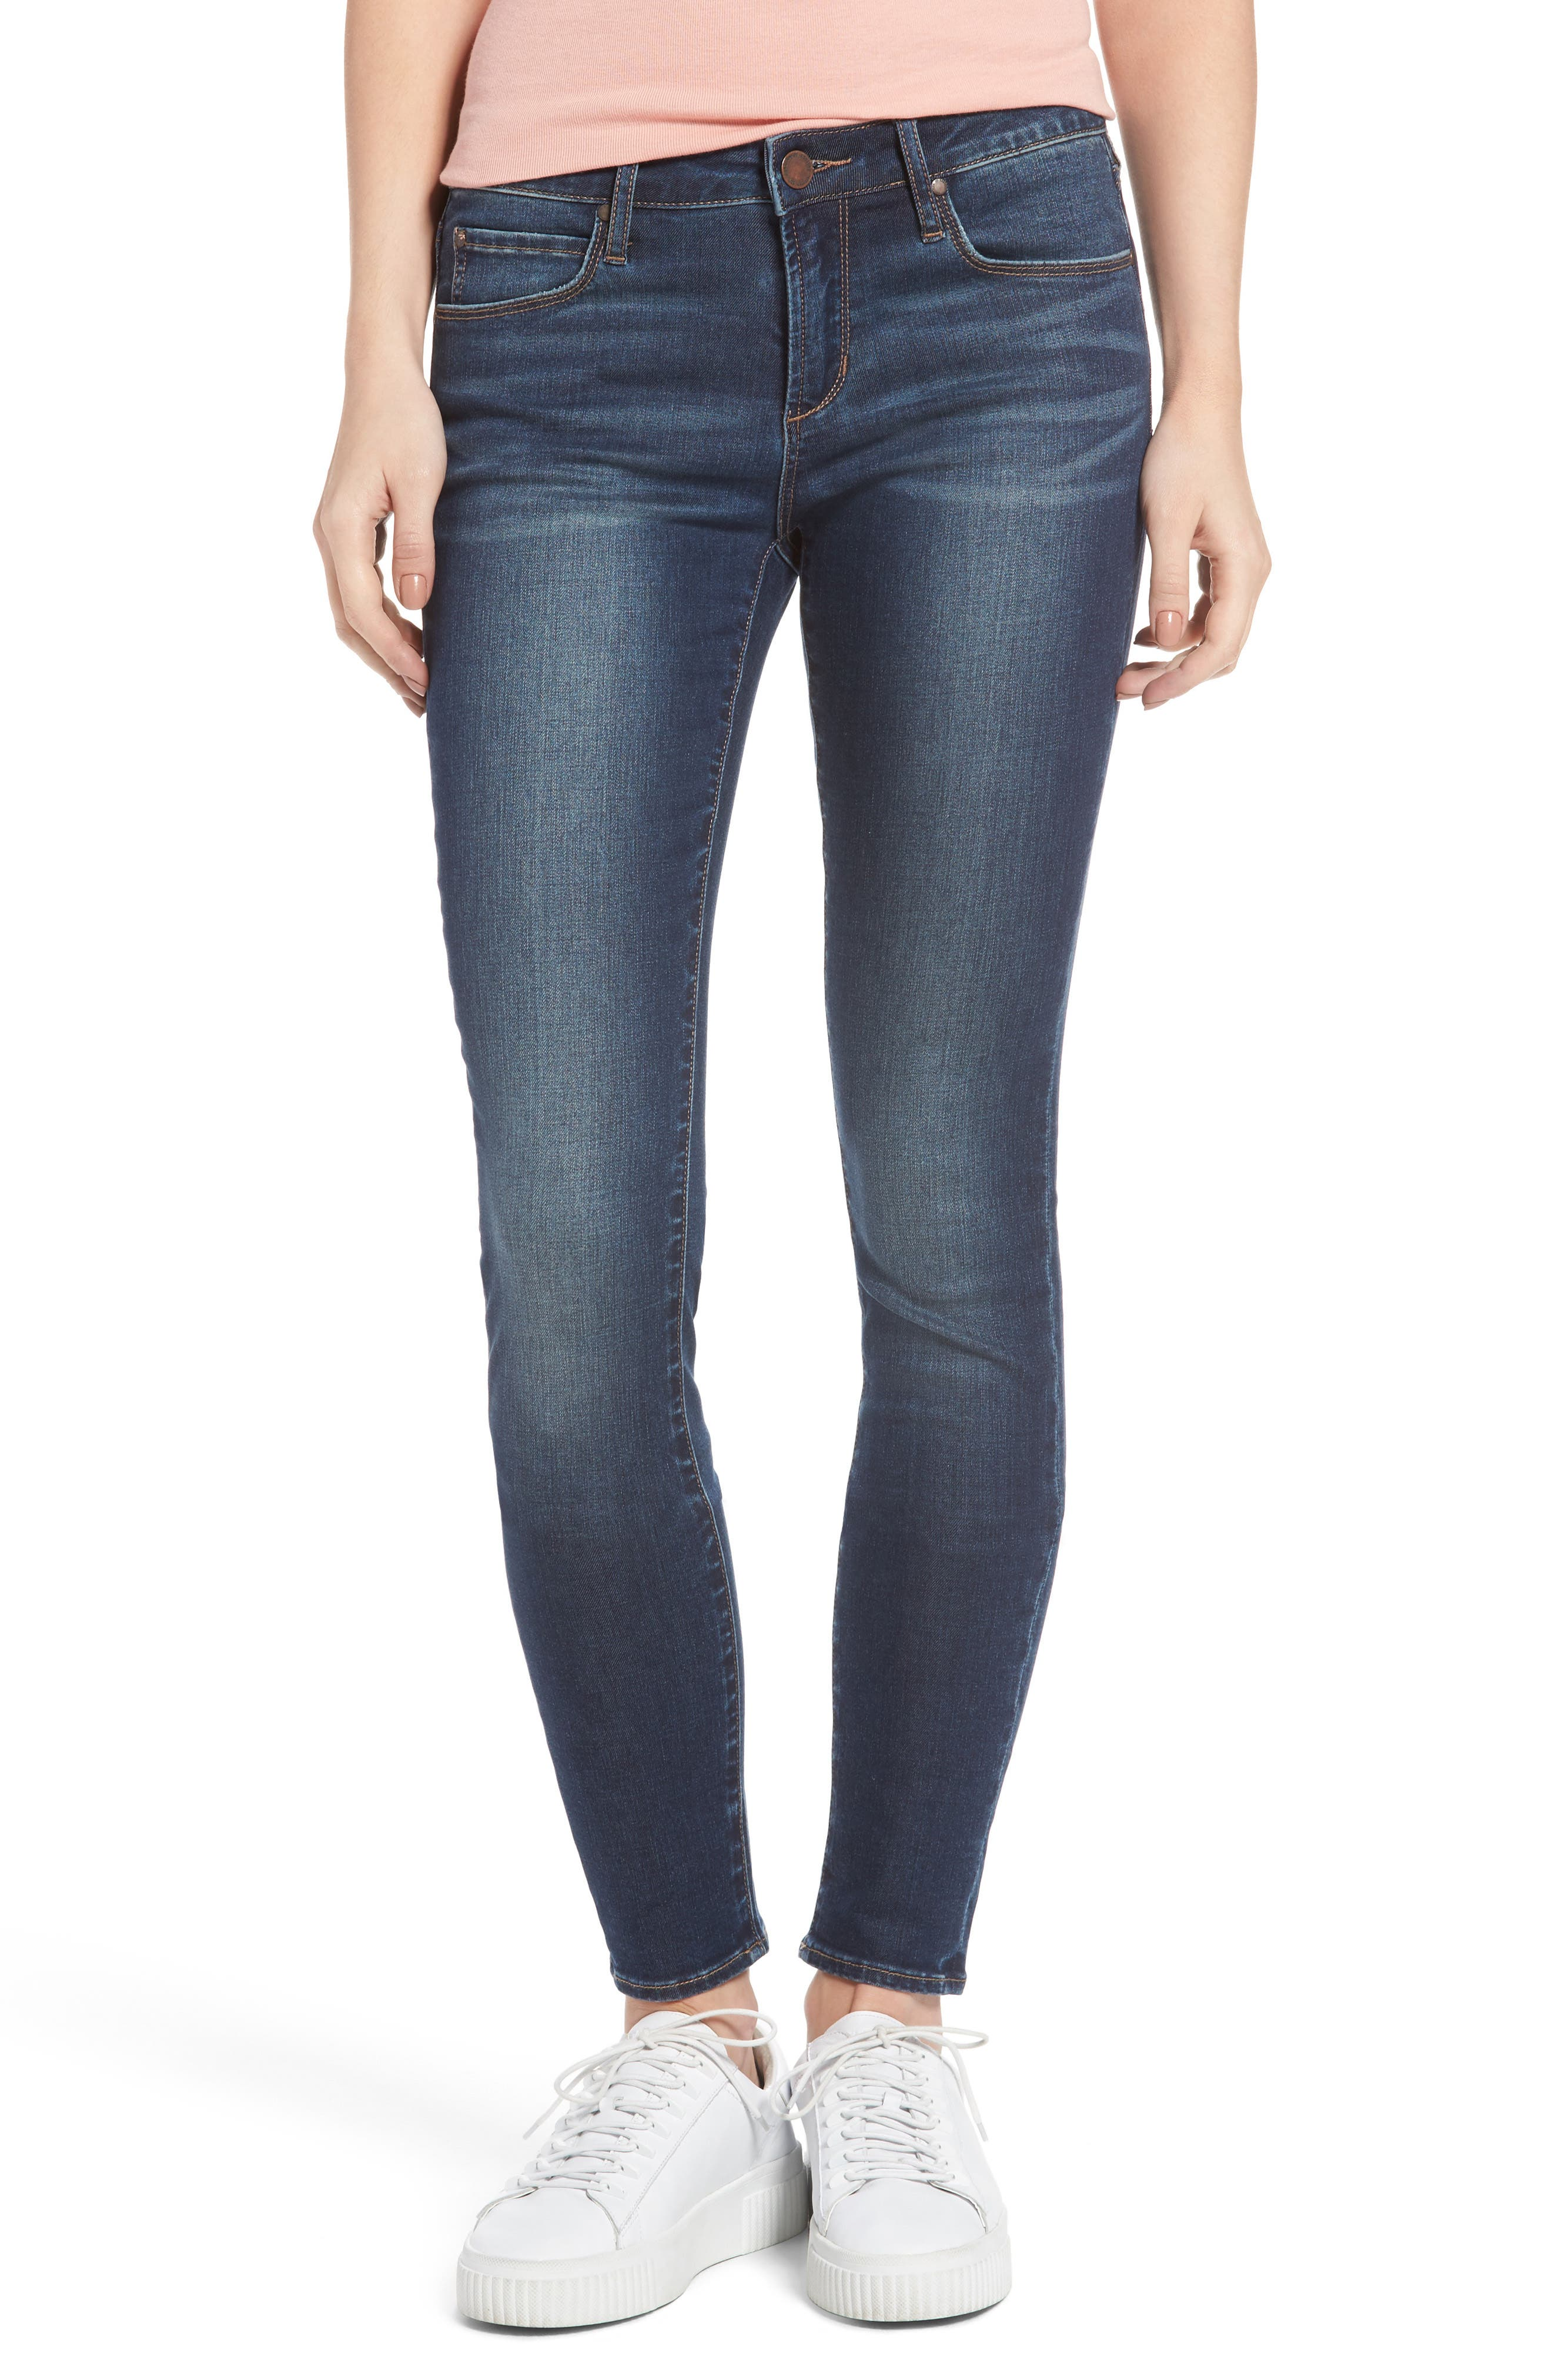 Melody Skinny Jeans,                             Main thumbnail 1, color,                             491